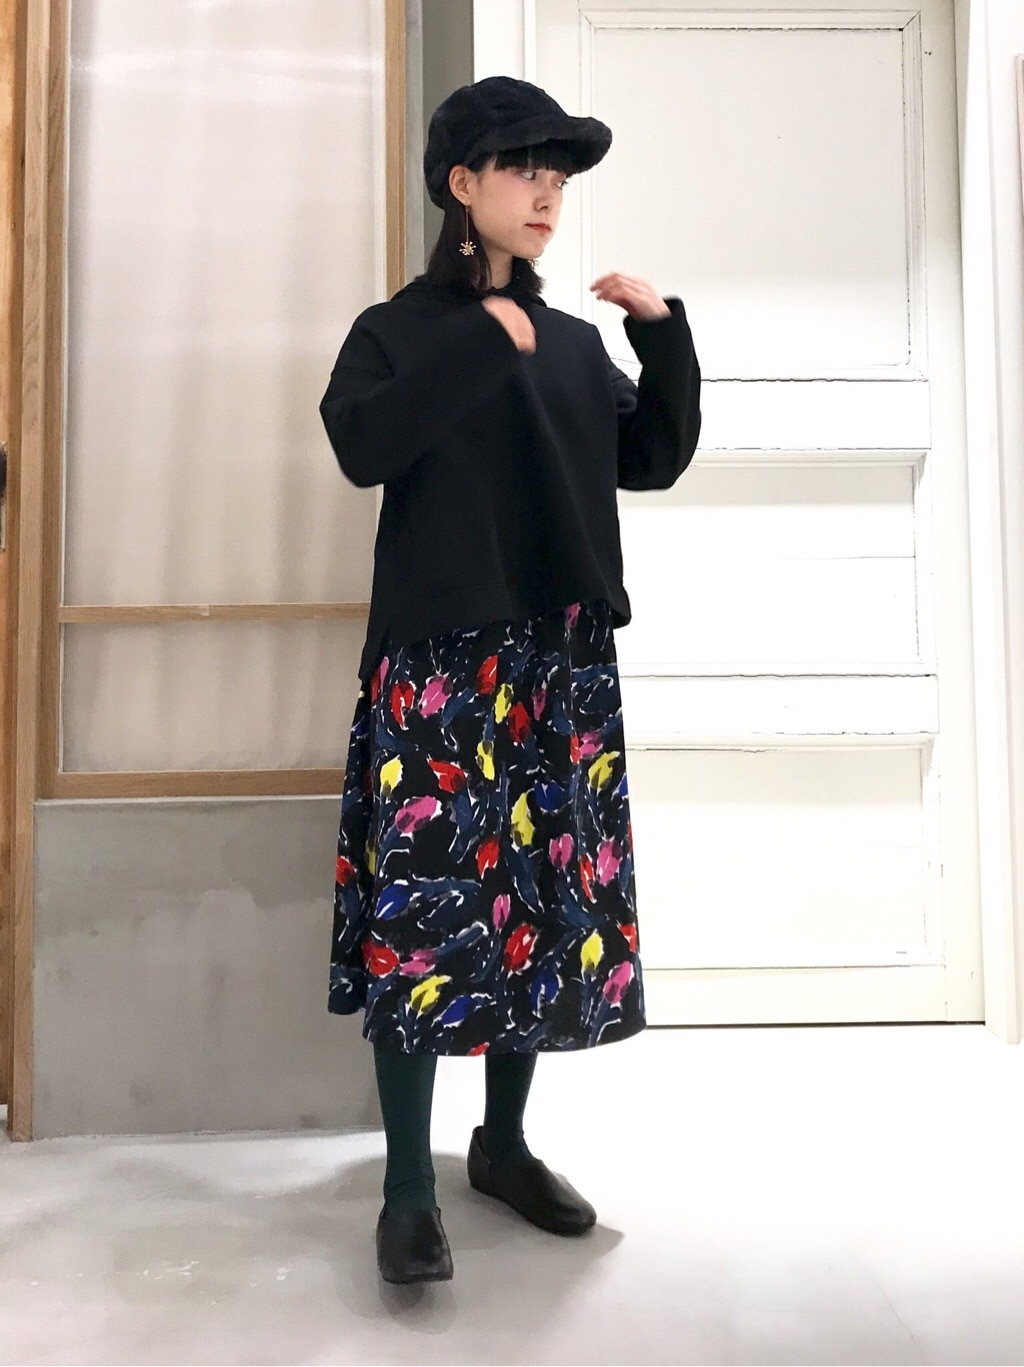 bulle de savon 渋谷スクランブルスクエア 身長:153cm 2019.11.26